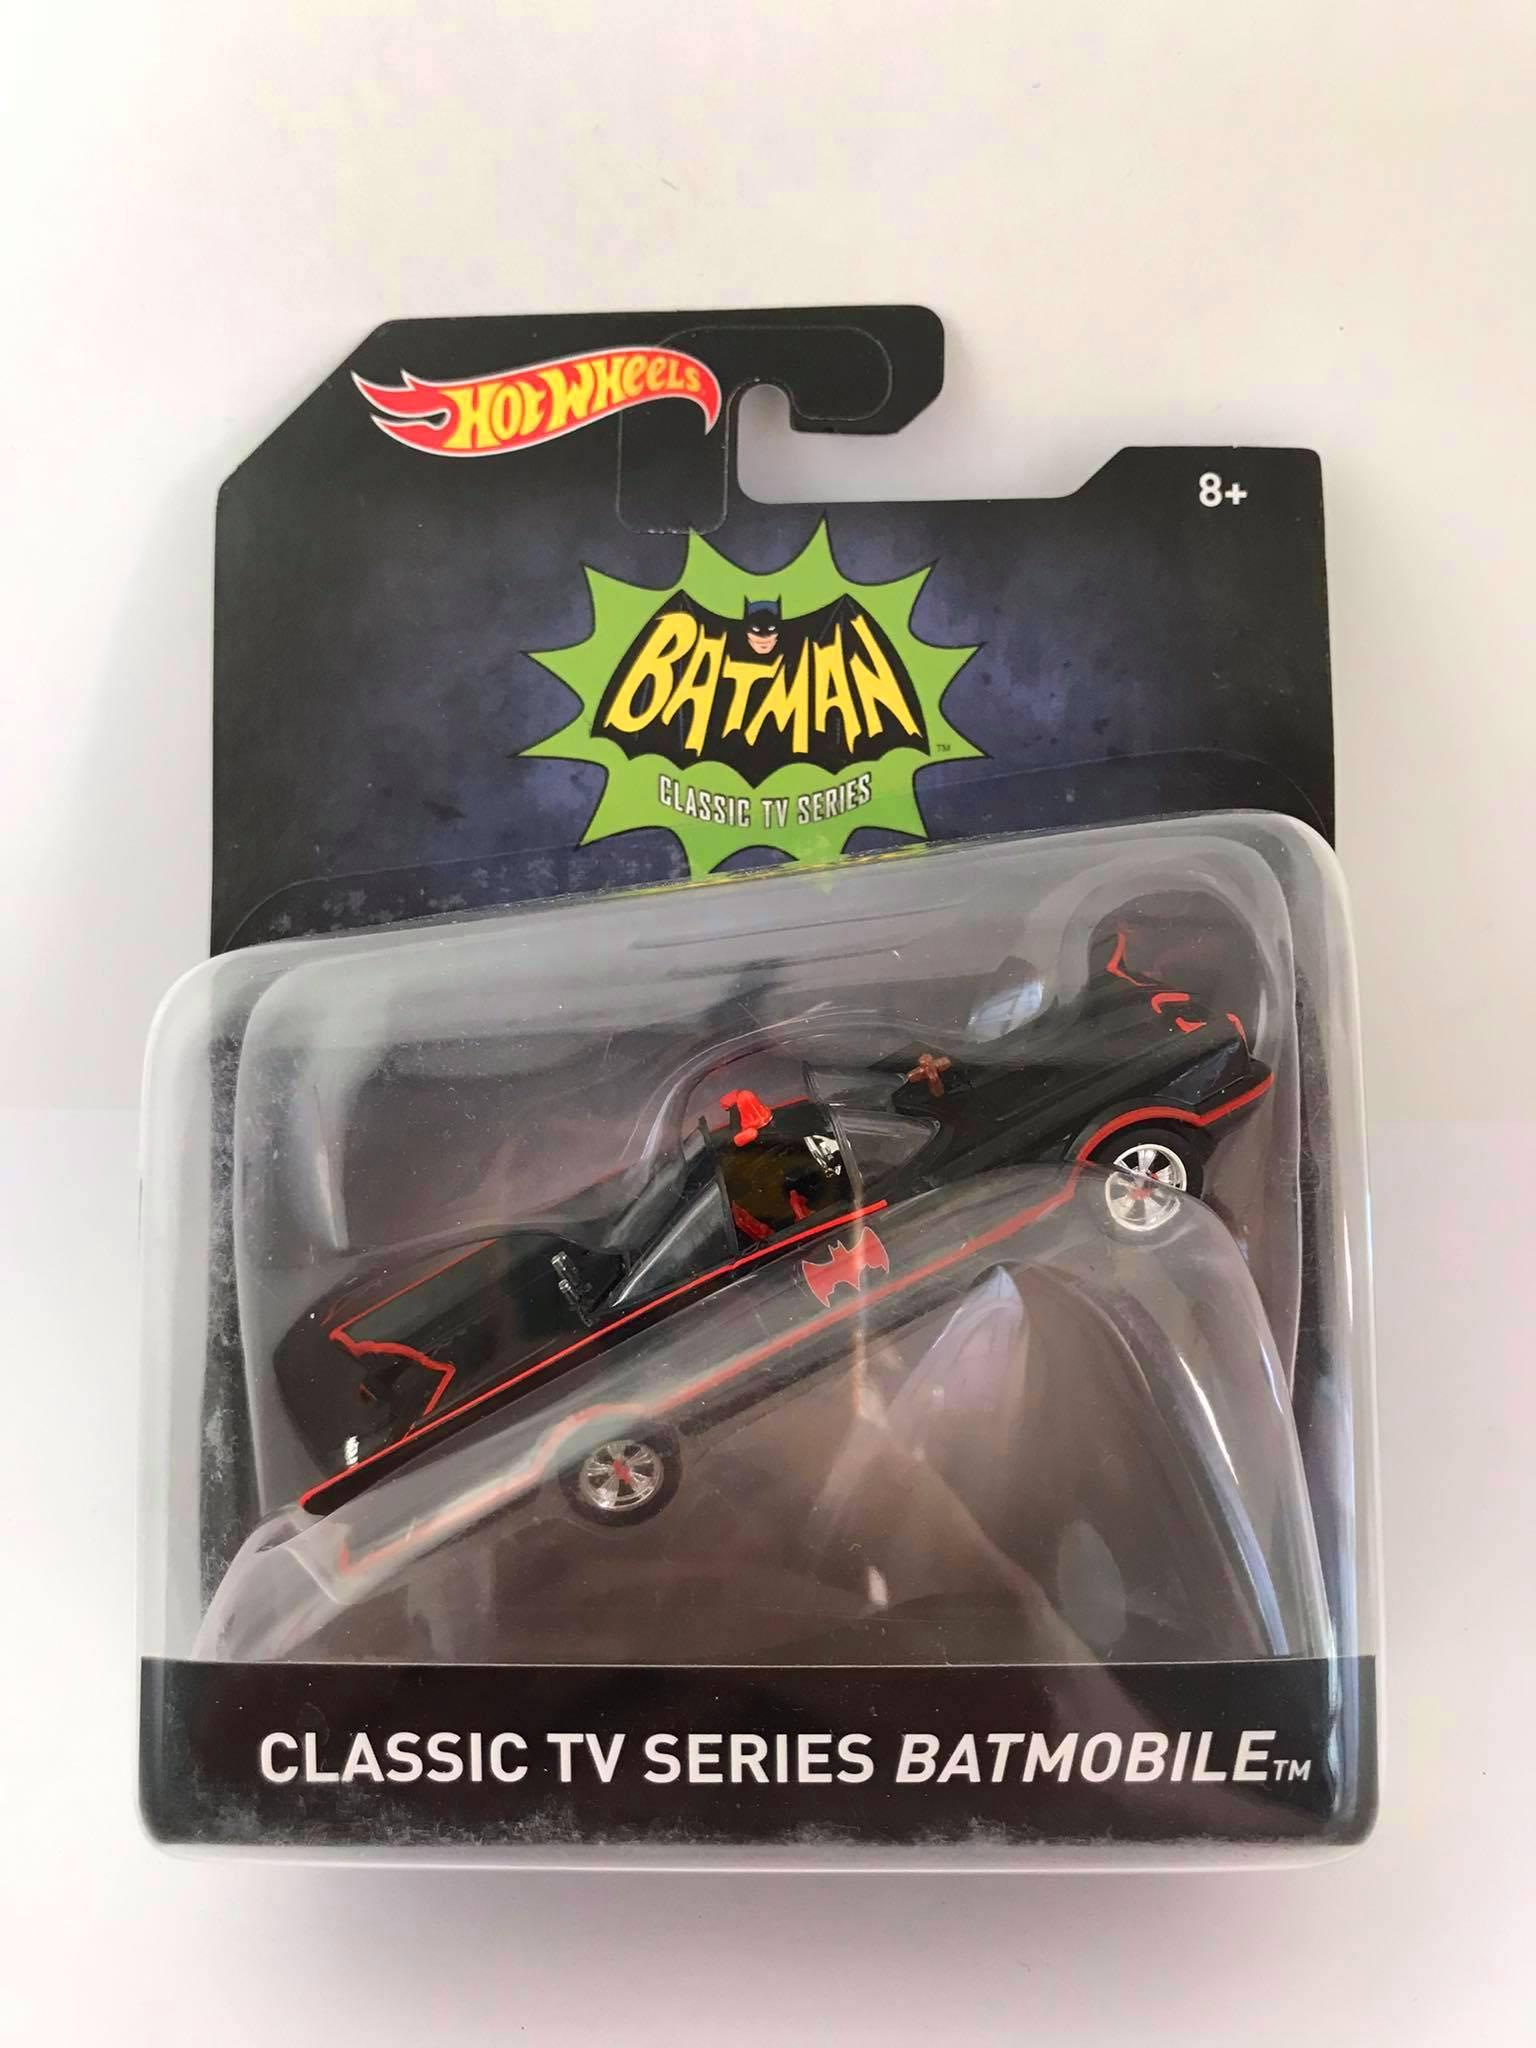 Hot Wheels - Classic Tv Series Batmobile - Batman - Escala 1:50